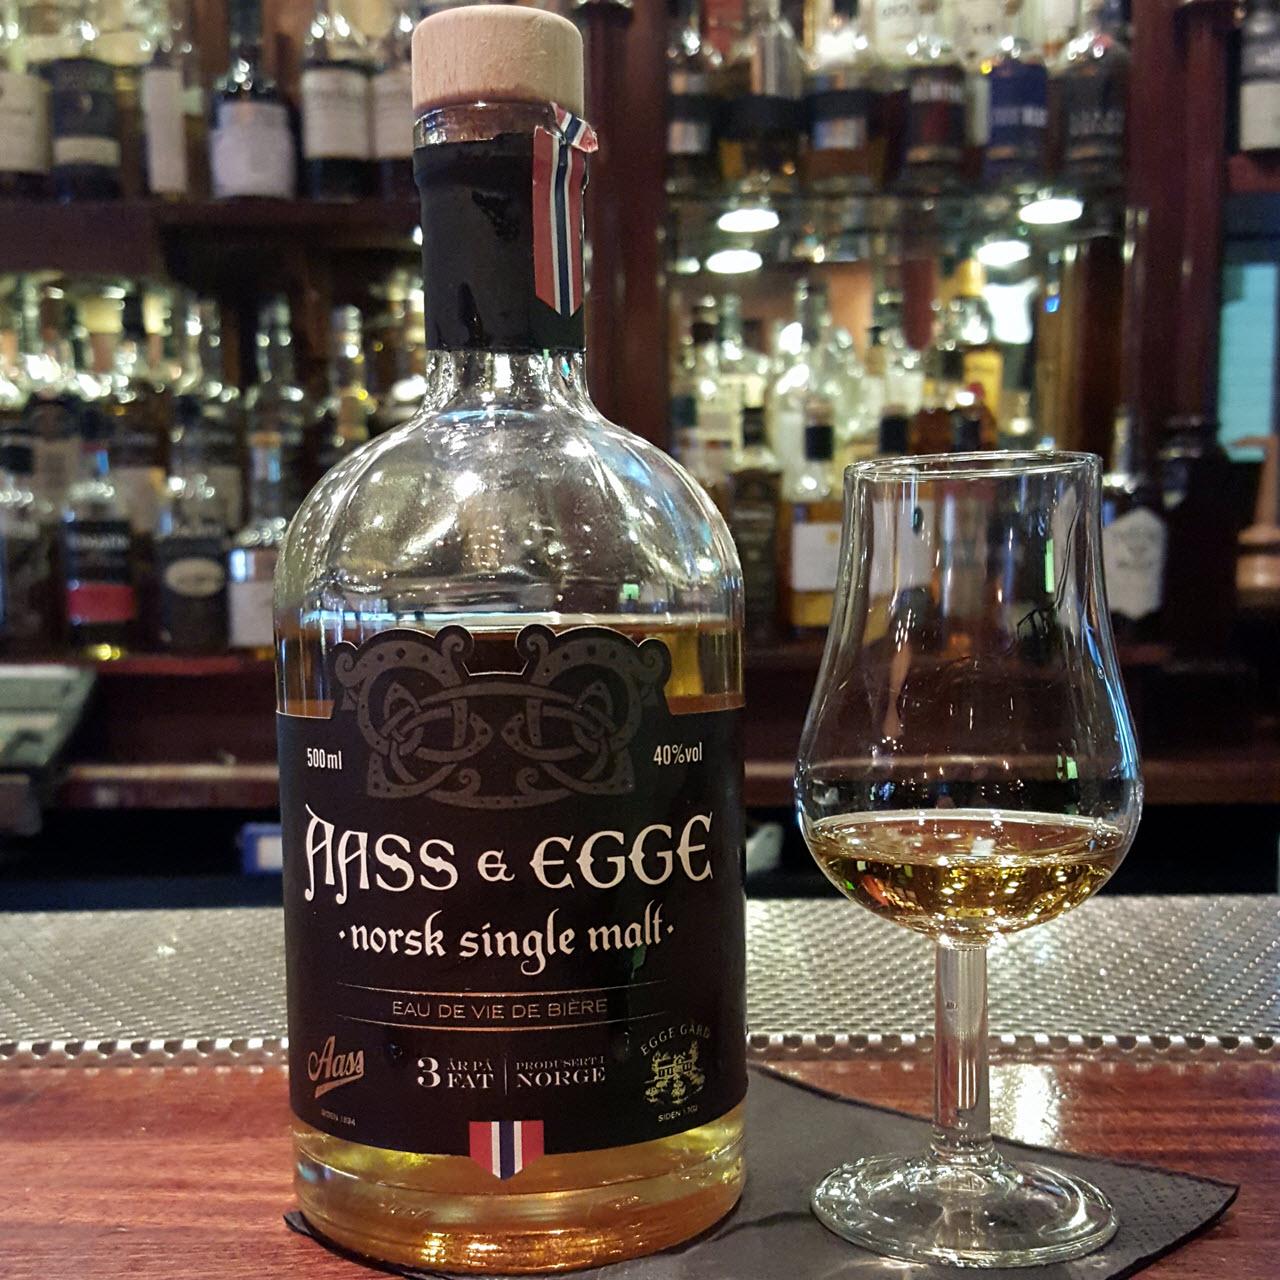 Aass & Egge - norsk single malt